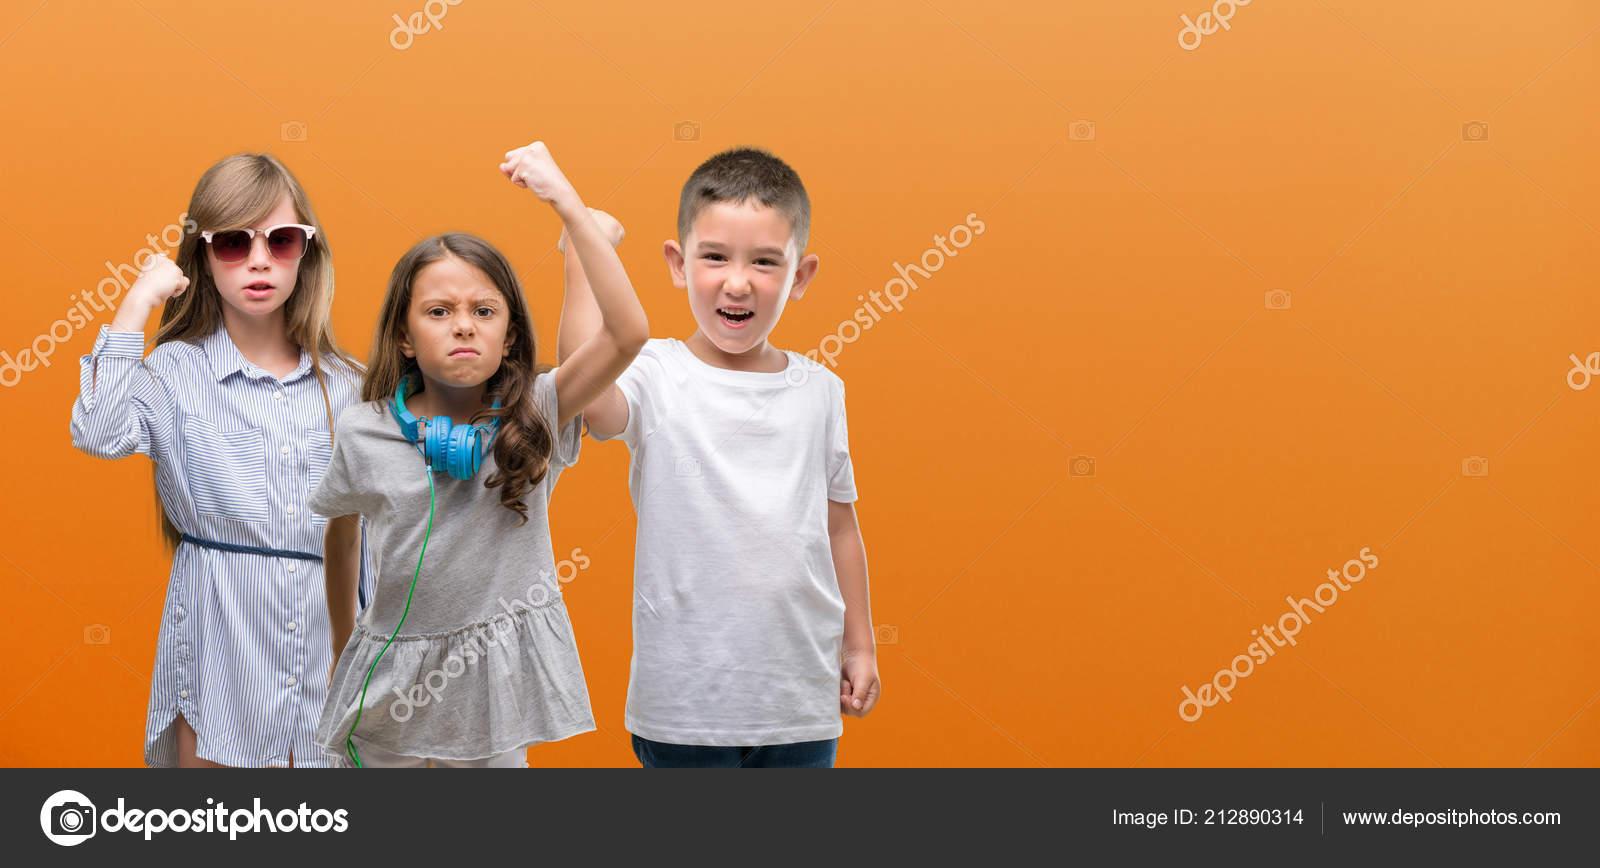 b7d528ca3b6 Ομάδα Αγόρι Και Κορίτσια Παιδιά Πάνω Από Πορτοκαλί Φόντο Ενοχλημένοι ...